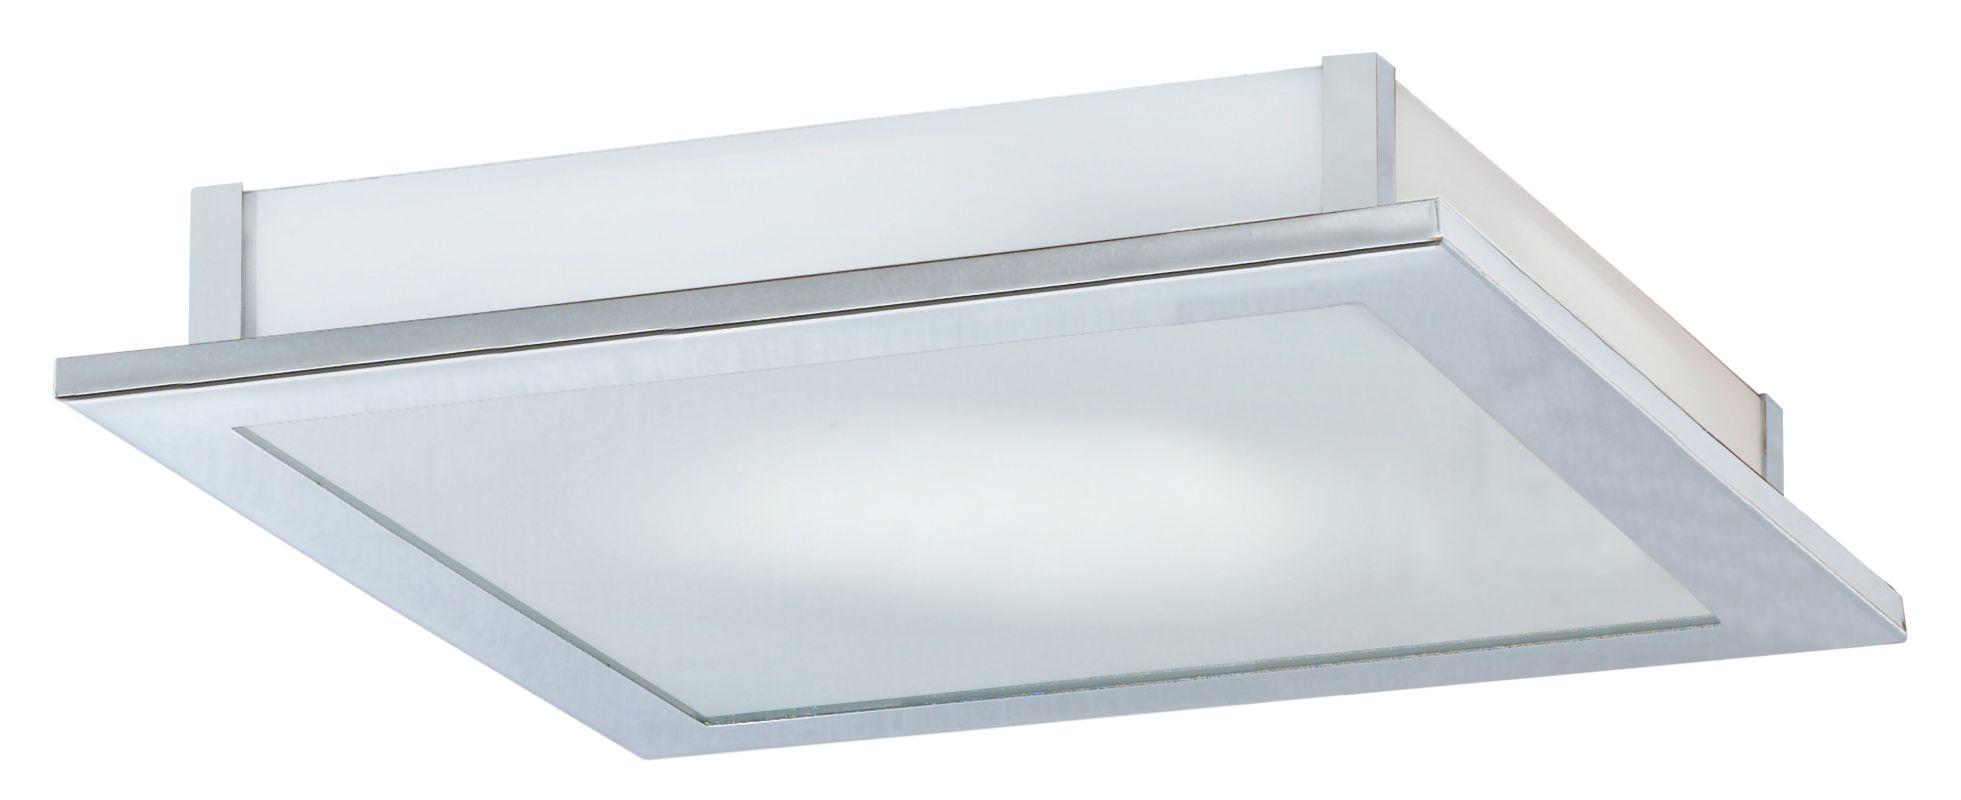 Eglo 85094 Auriga Single-Light Semi-Flush Fixture Chrome Indoor